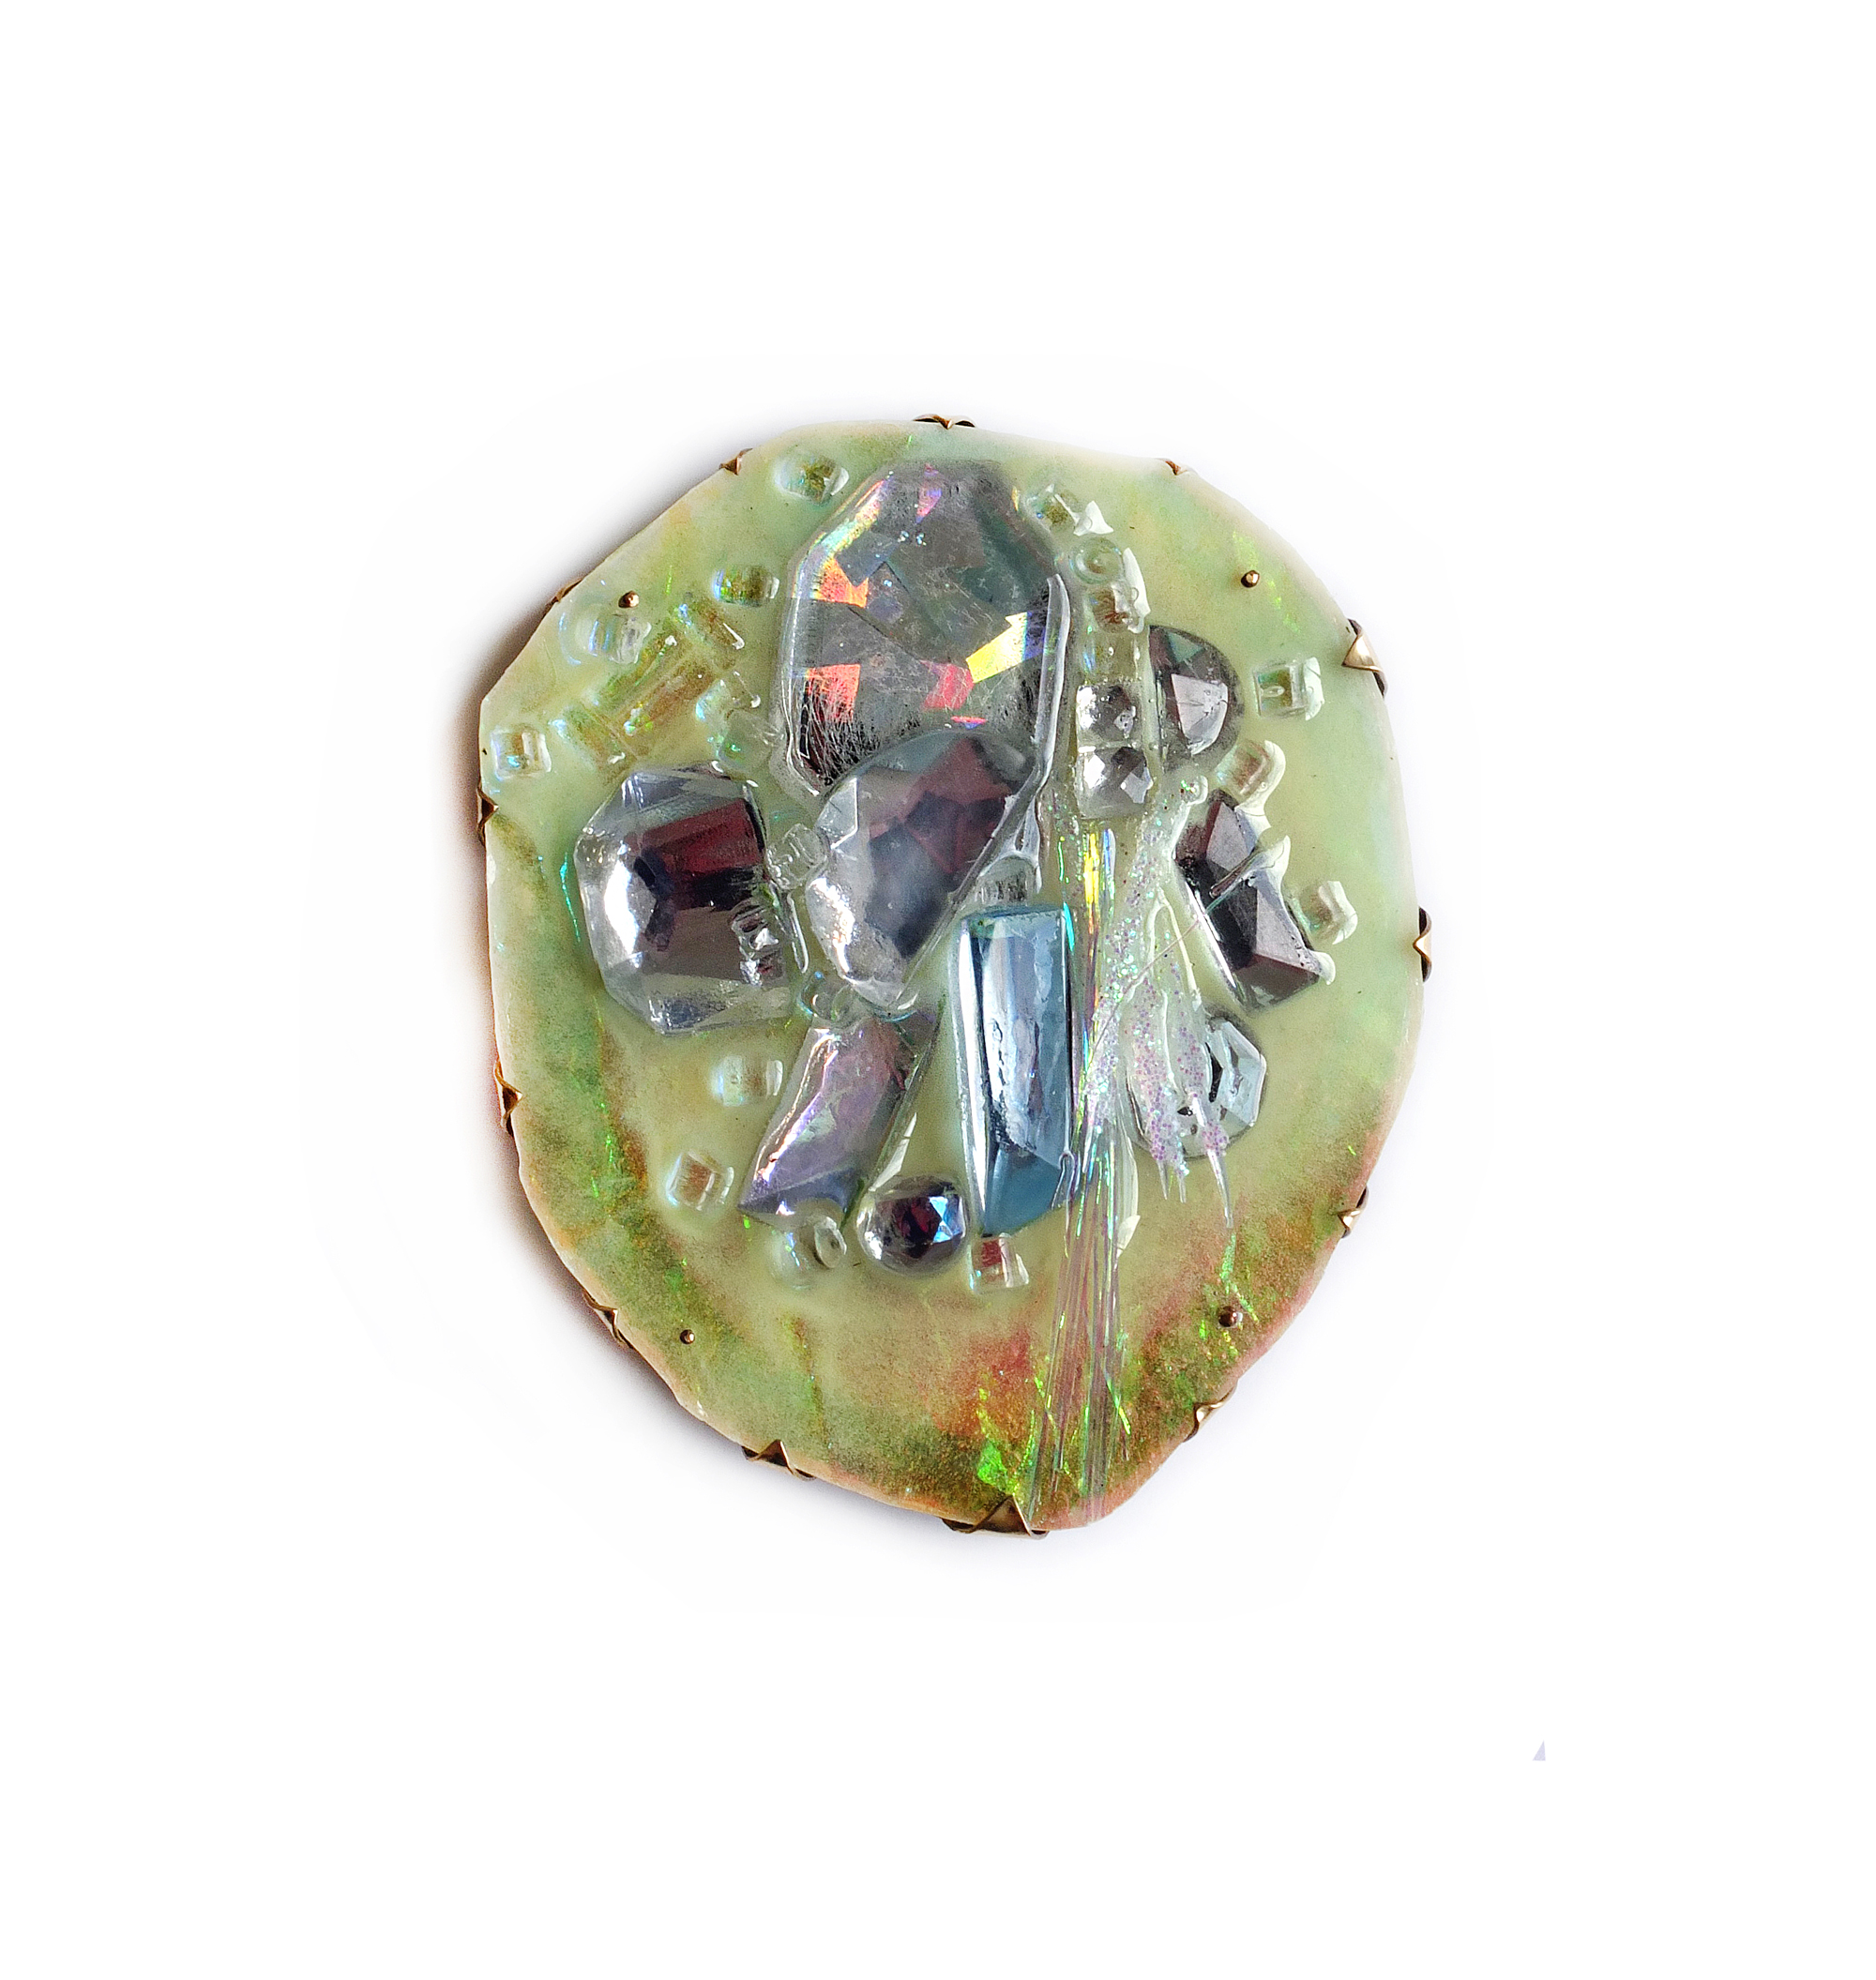 Nikki Couppee, Glow Gems Brooch, Plexiglass, brass, found objects, steel